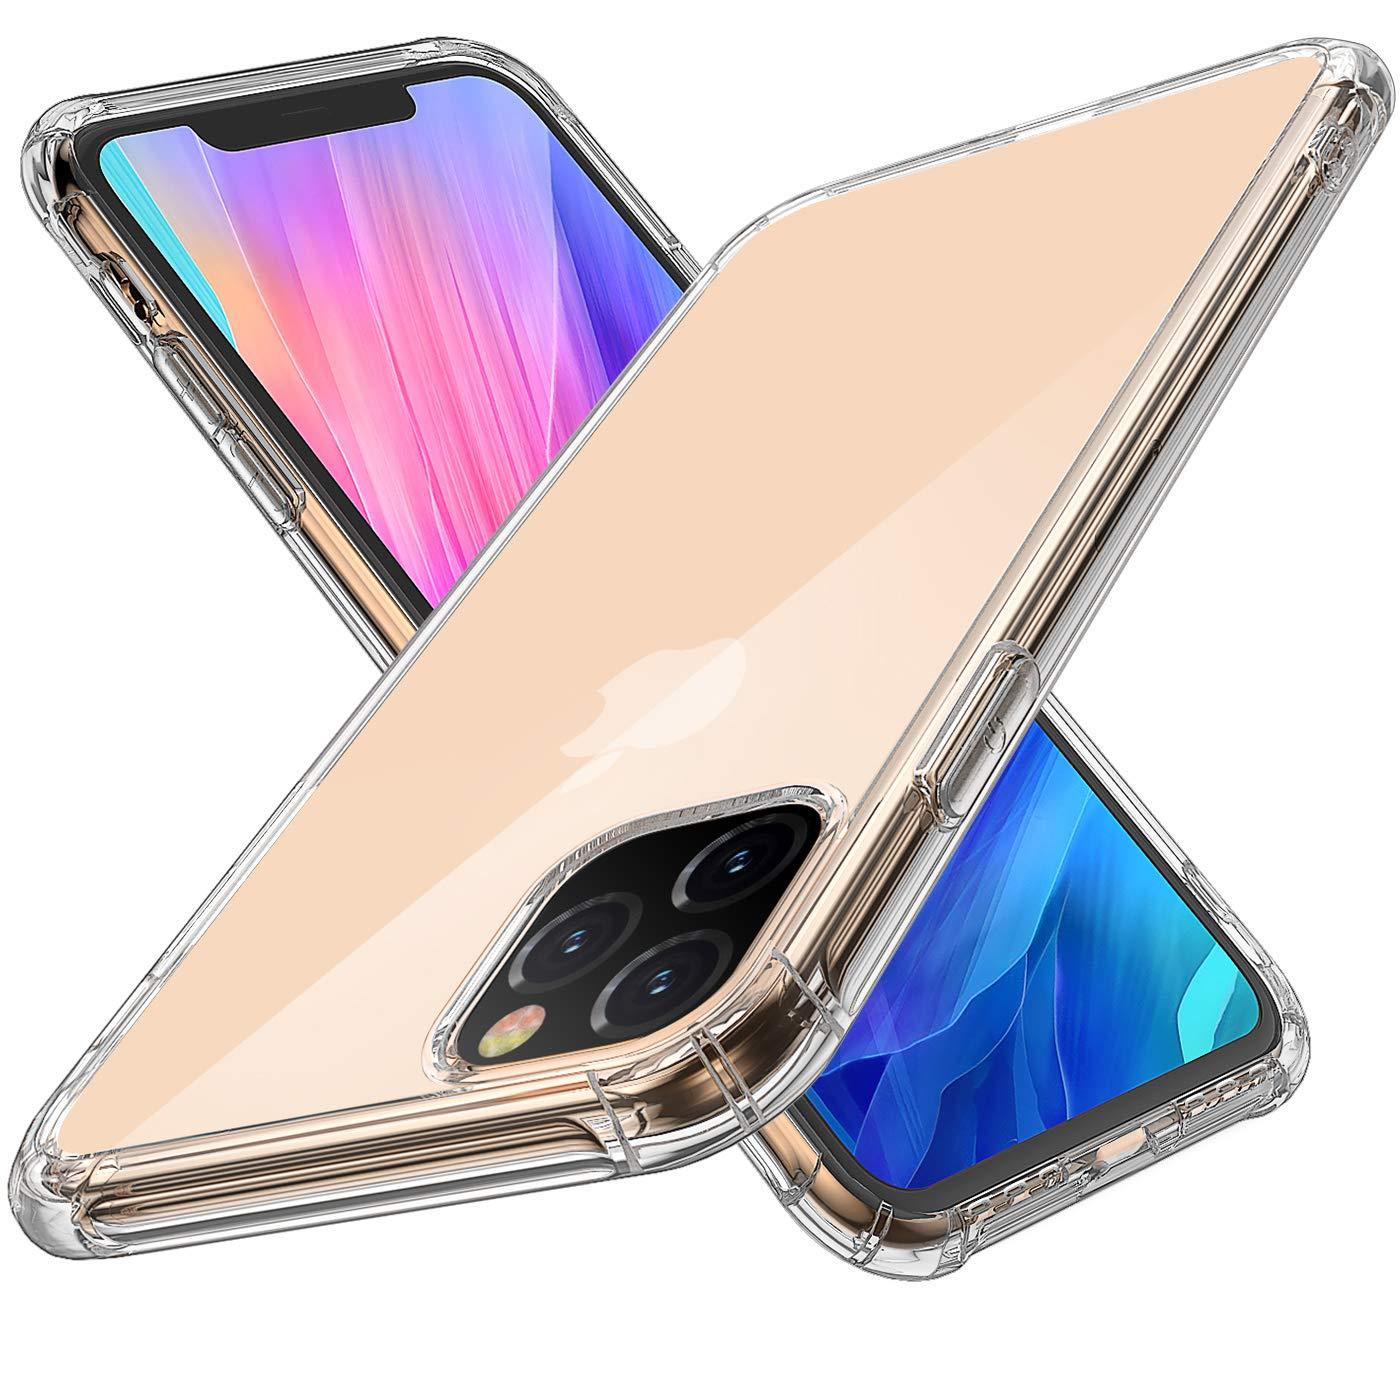 Funda Iphone 11 Pro Max WATACHE [7WW42C3V]